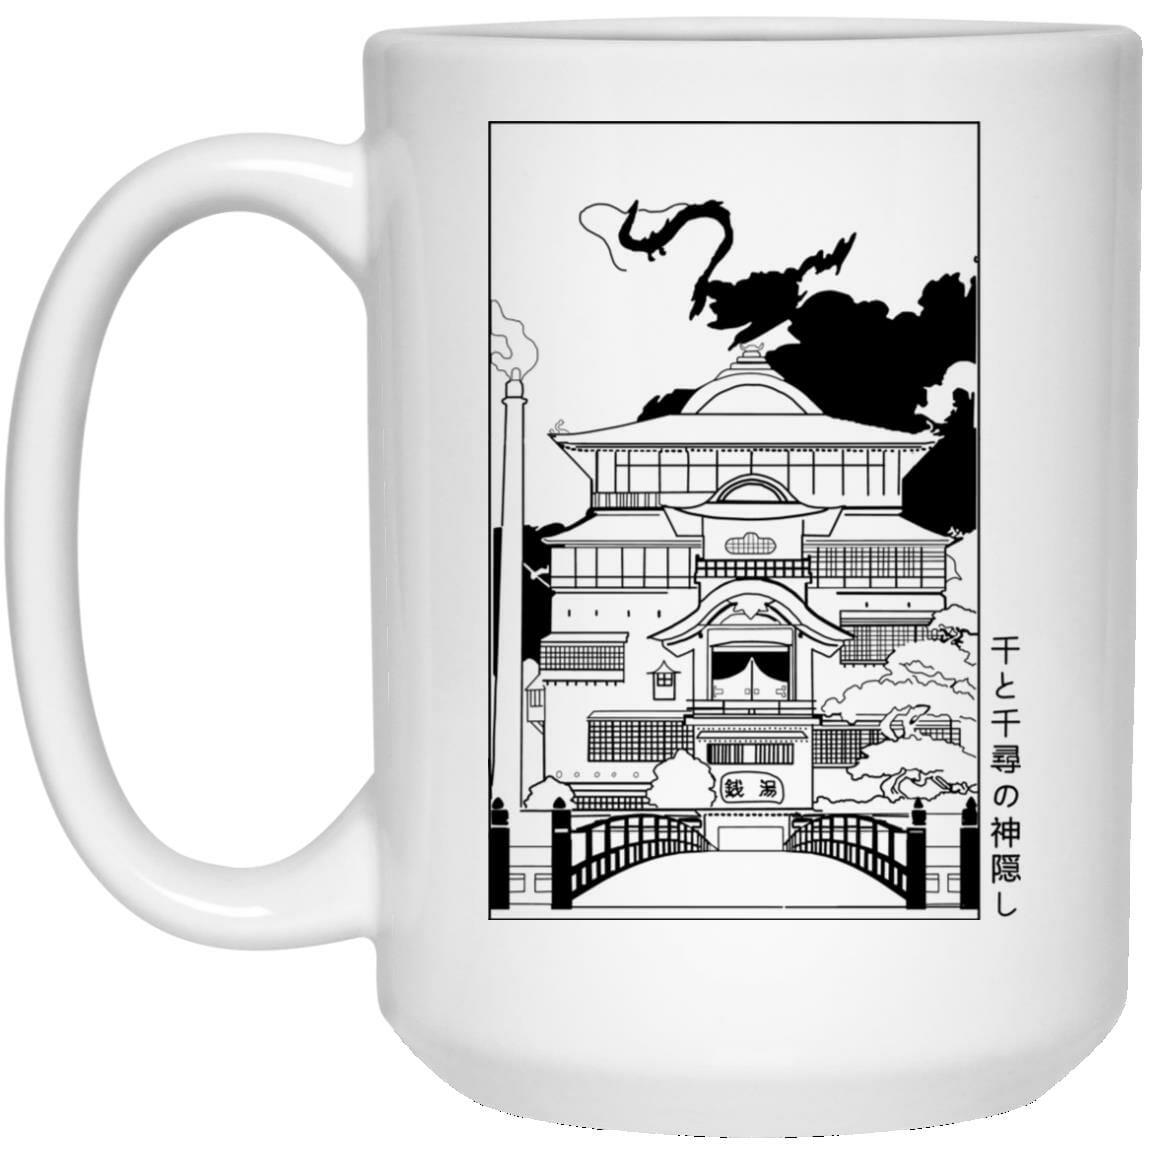 Spirited Away Bathhouse illustrated Graphic Mug